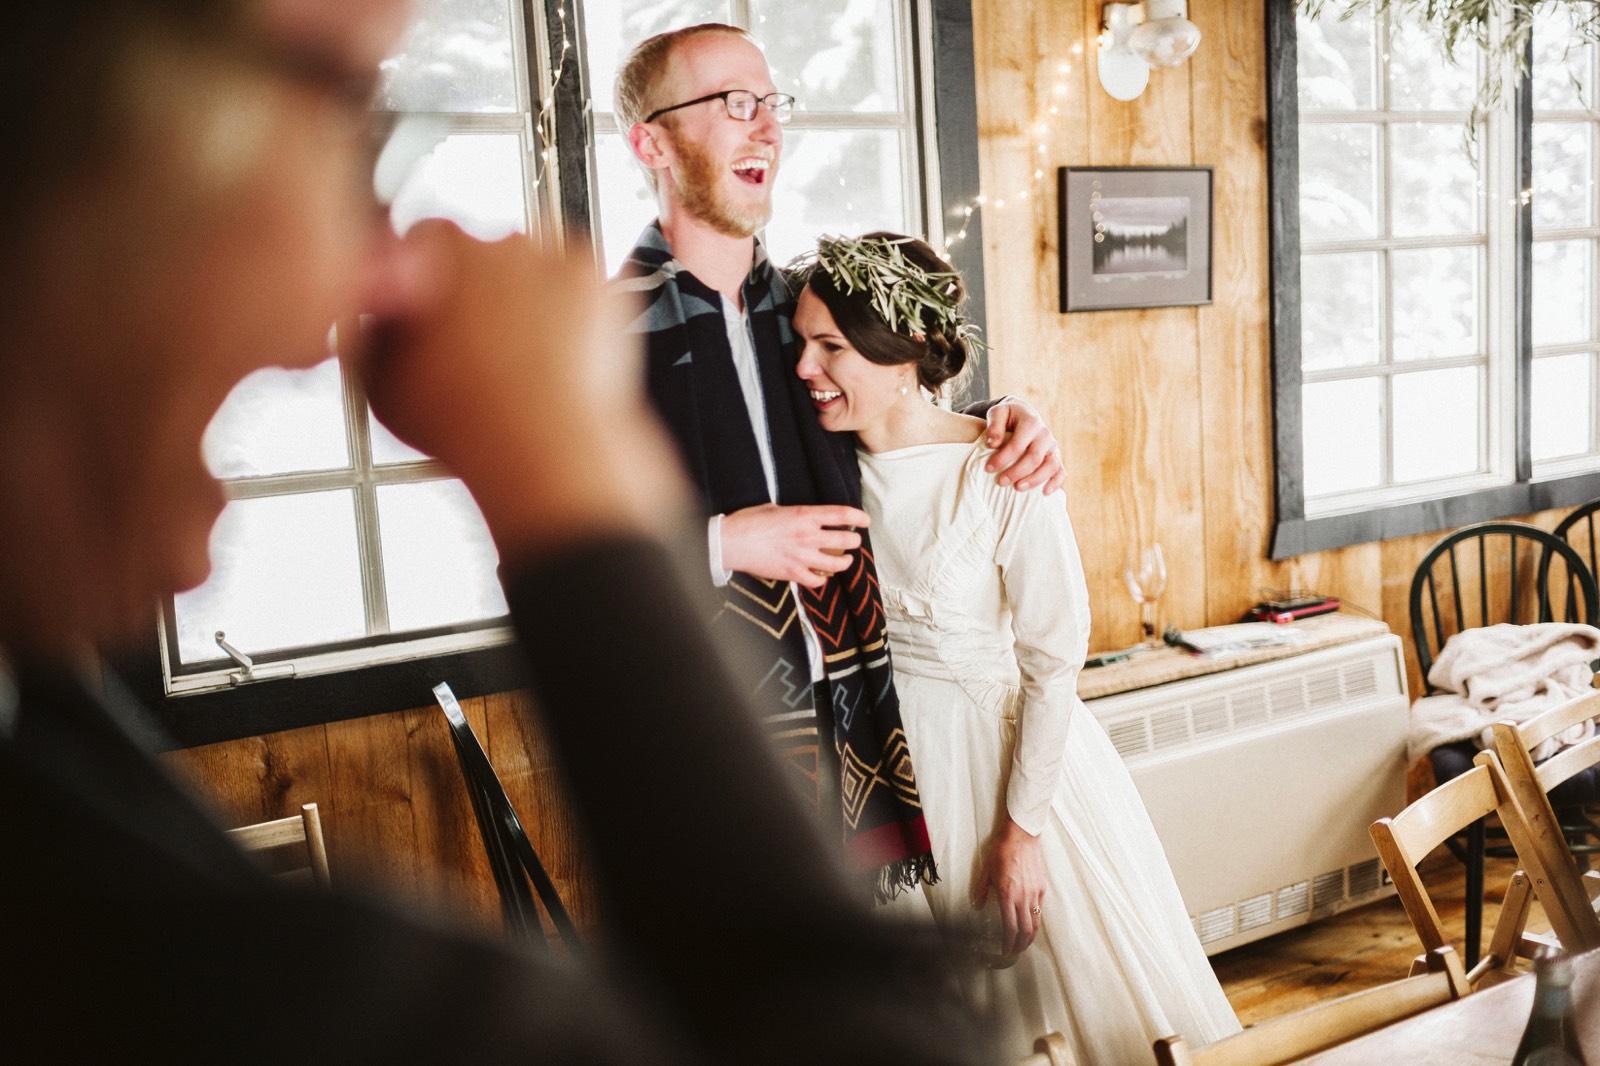 alpine-lakes-high-camp-winter-wedding-78 ALPINE LAKES HIGH CAMP WEDDING